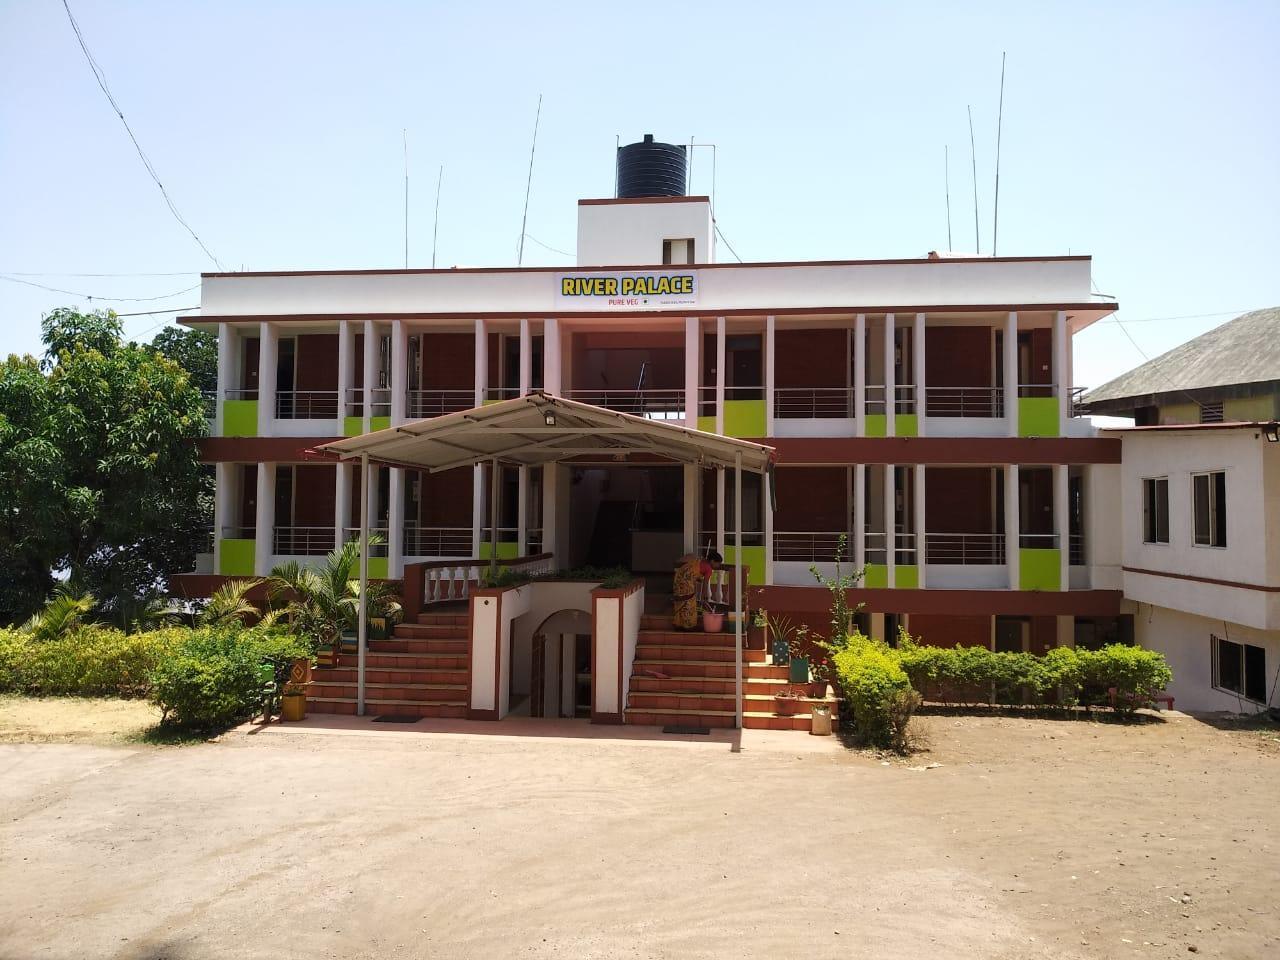 River Palace